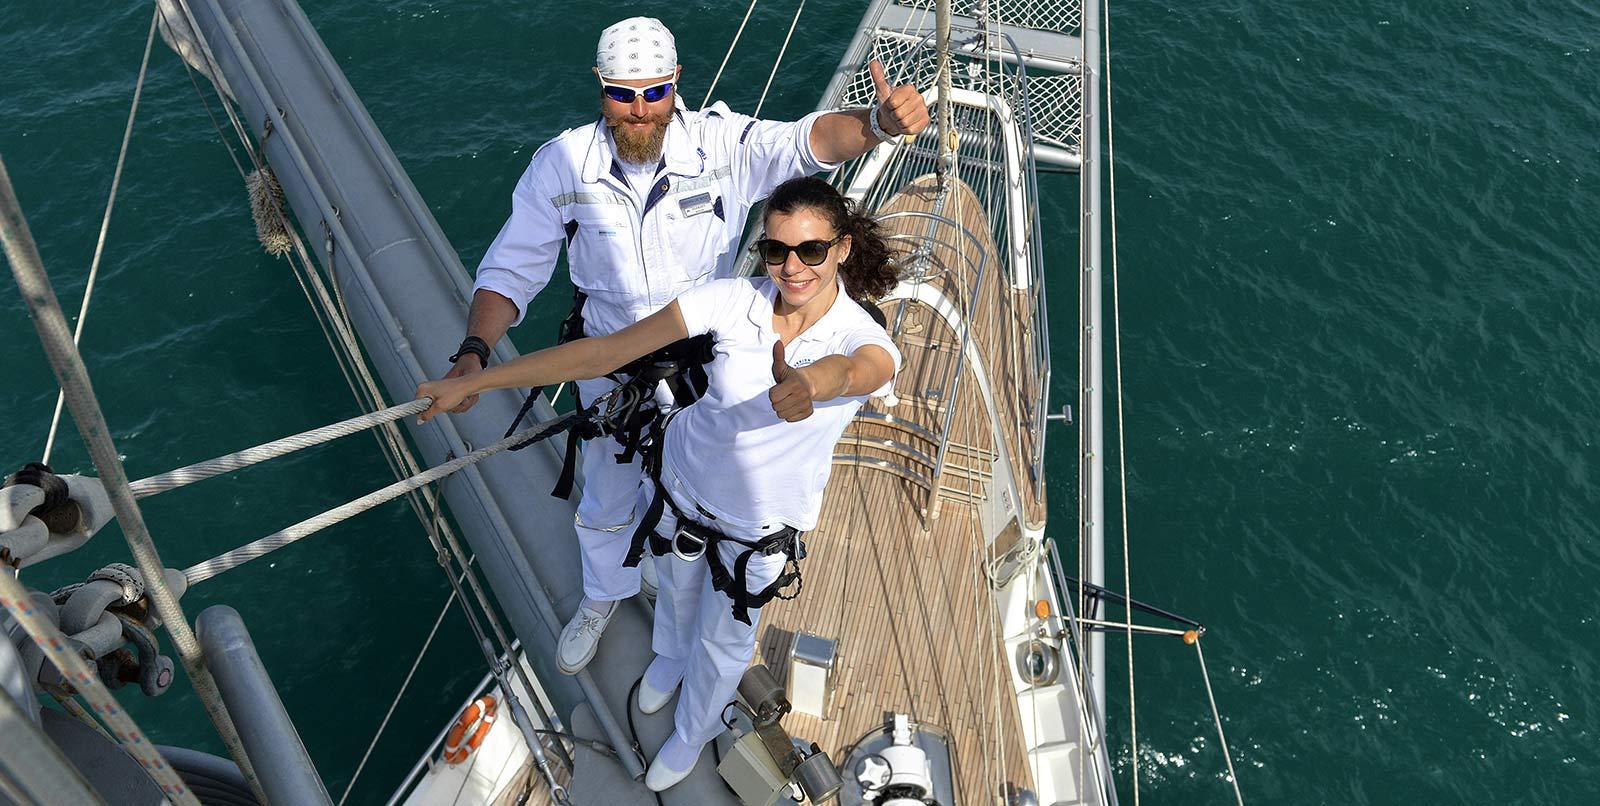 golf-and-sail-itinerary-day5-1.jpg